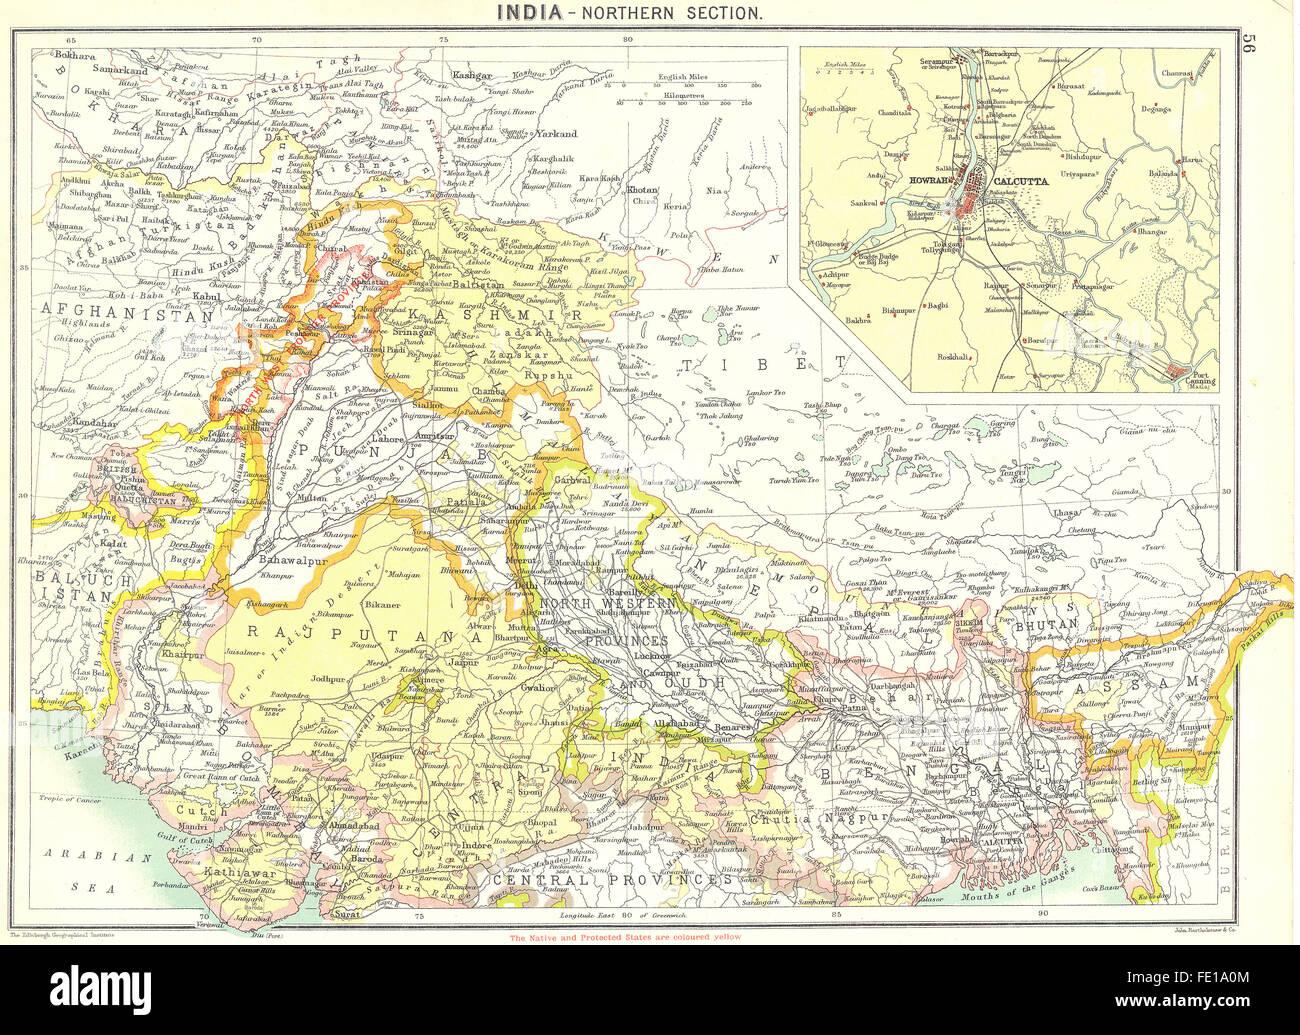 India North Howrah Kolkata 1900 Antique Map Stock Photo 94686836